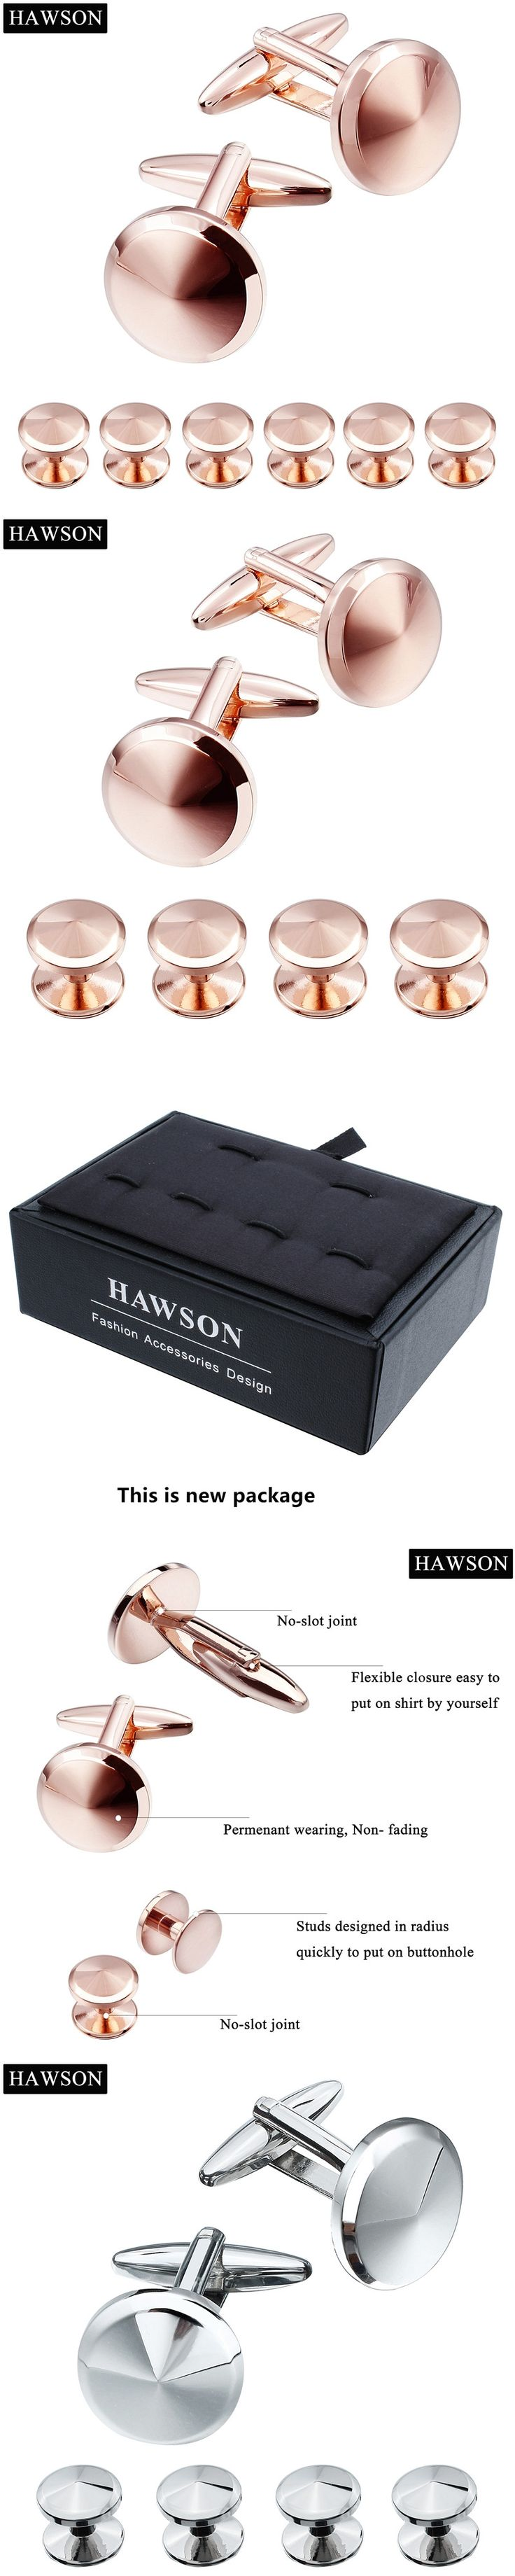 HAWSON Metal Cufflinks Studs Set Rose Gold Color Tuxedo Shirt Cuff links&Studs with Gift Box